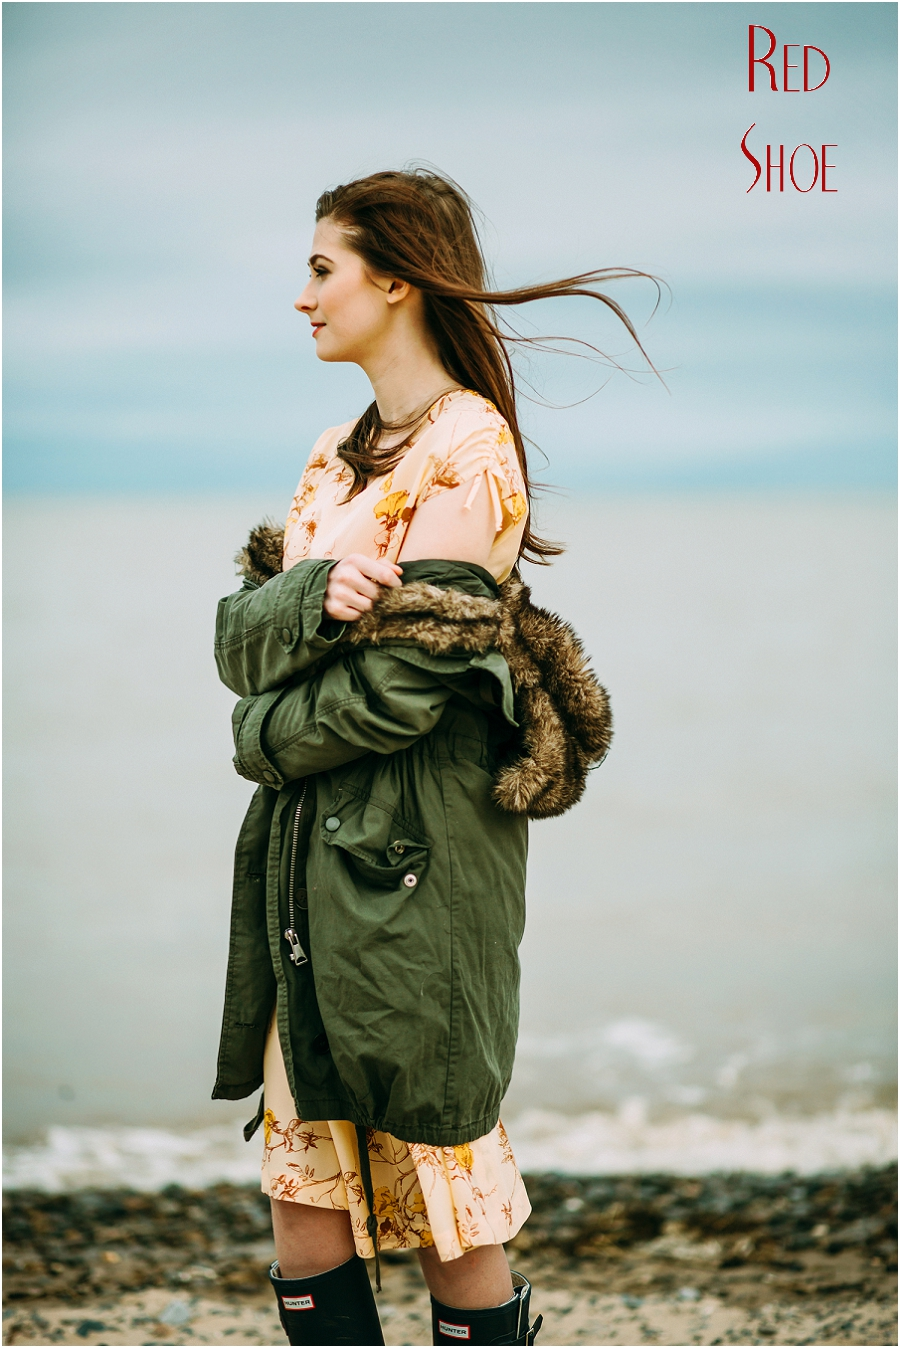 Red Shoe Photography, Beach photo shoot, Fashion, editorial_0032.jpg